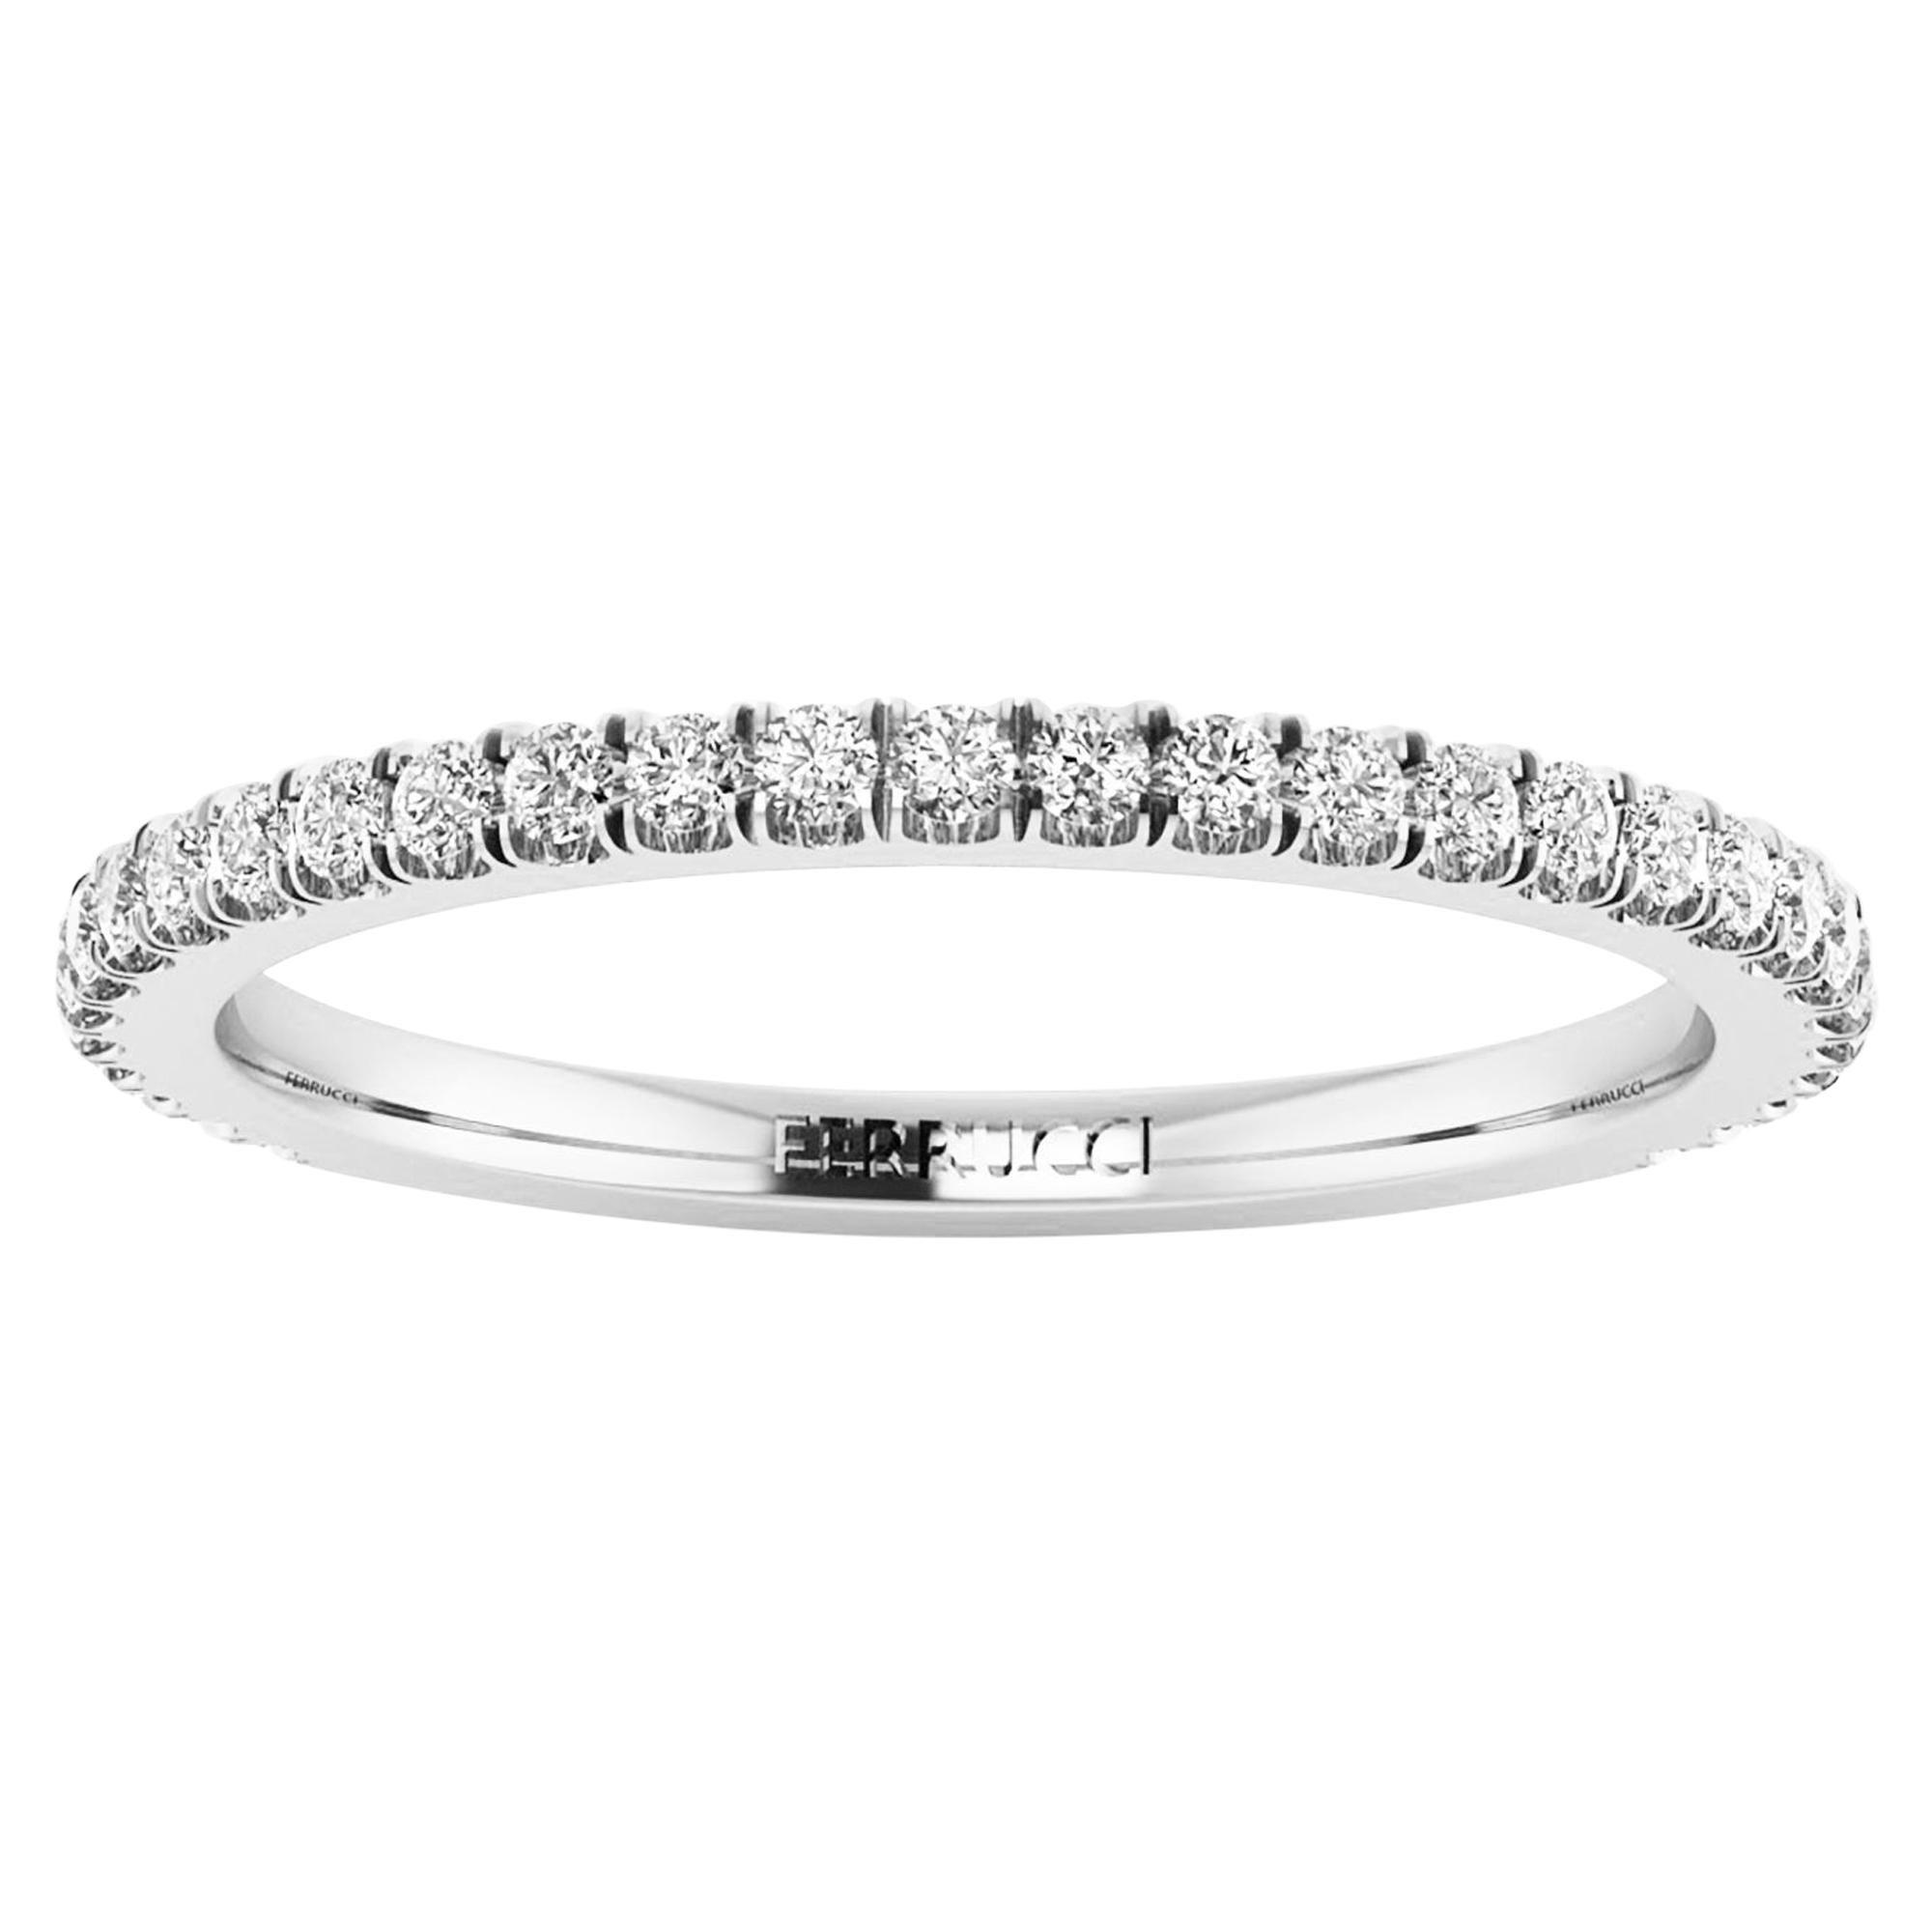 Thin Diamonds Pavé Stackable Band Platinum 950 Ring